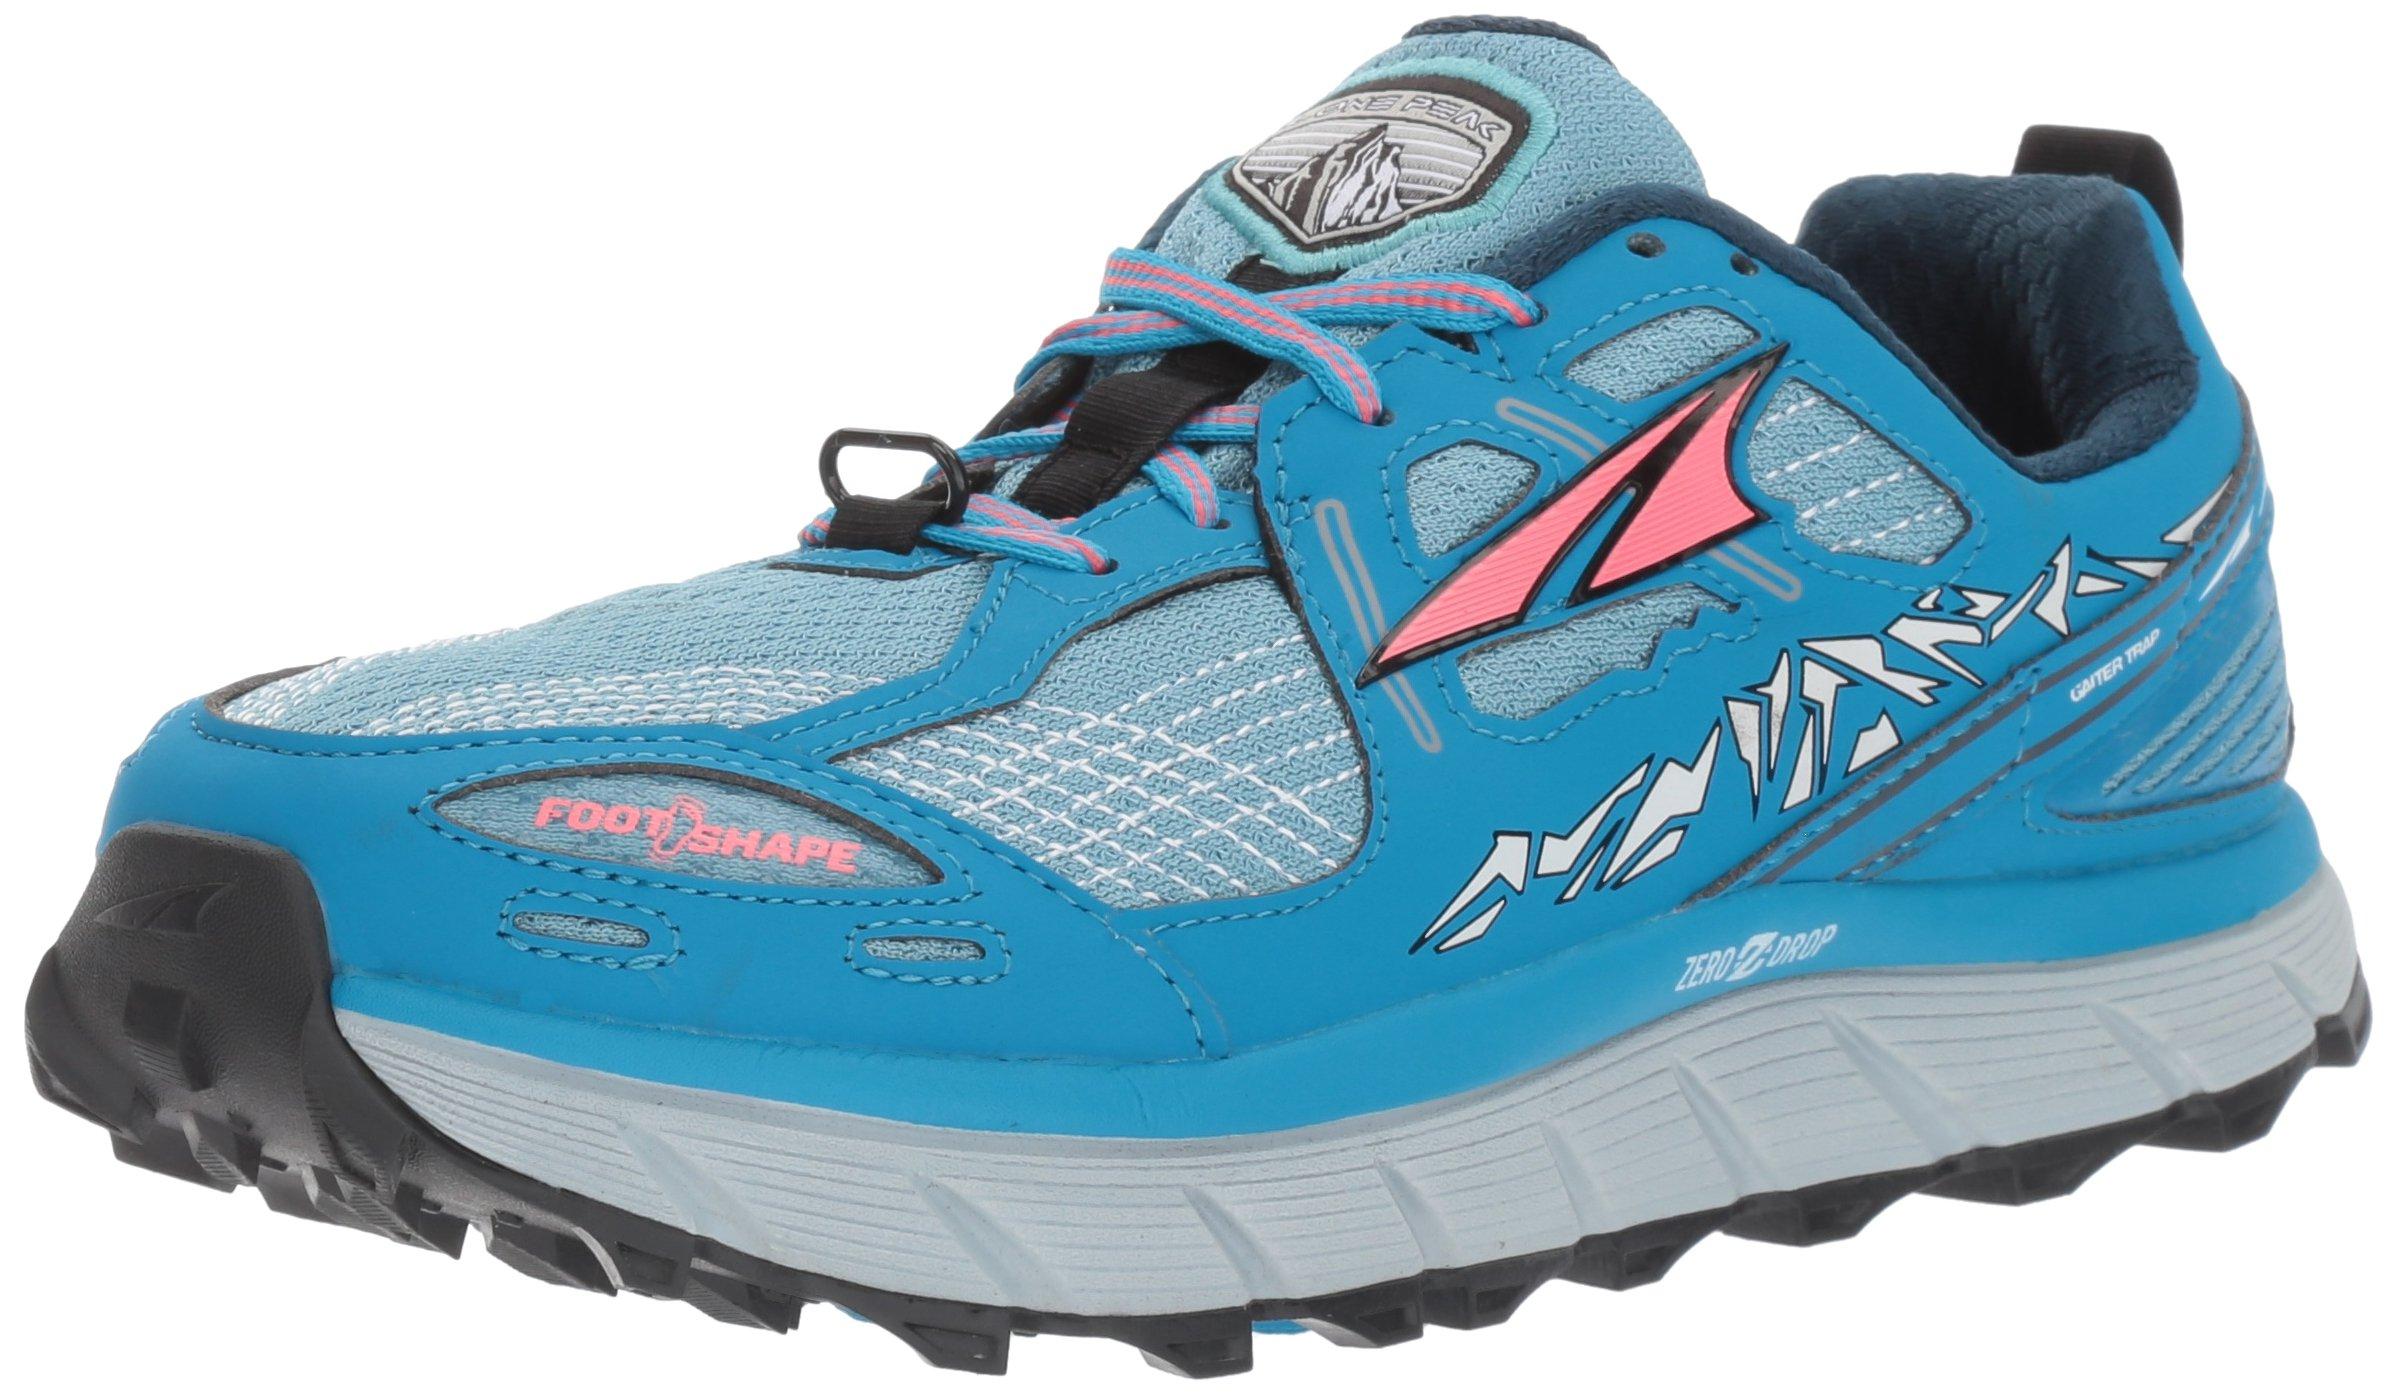 Altra Women's Lone Peak 3.5 Running Shoe, Blue, 6.5 B US